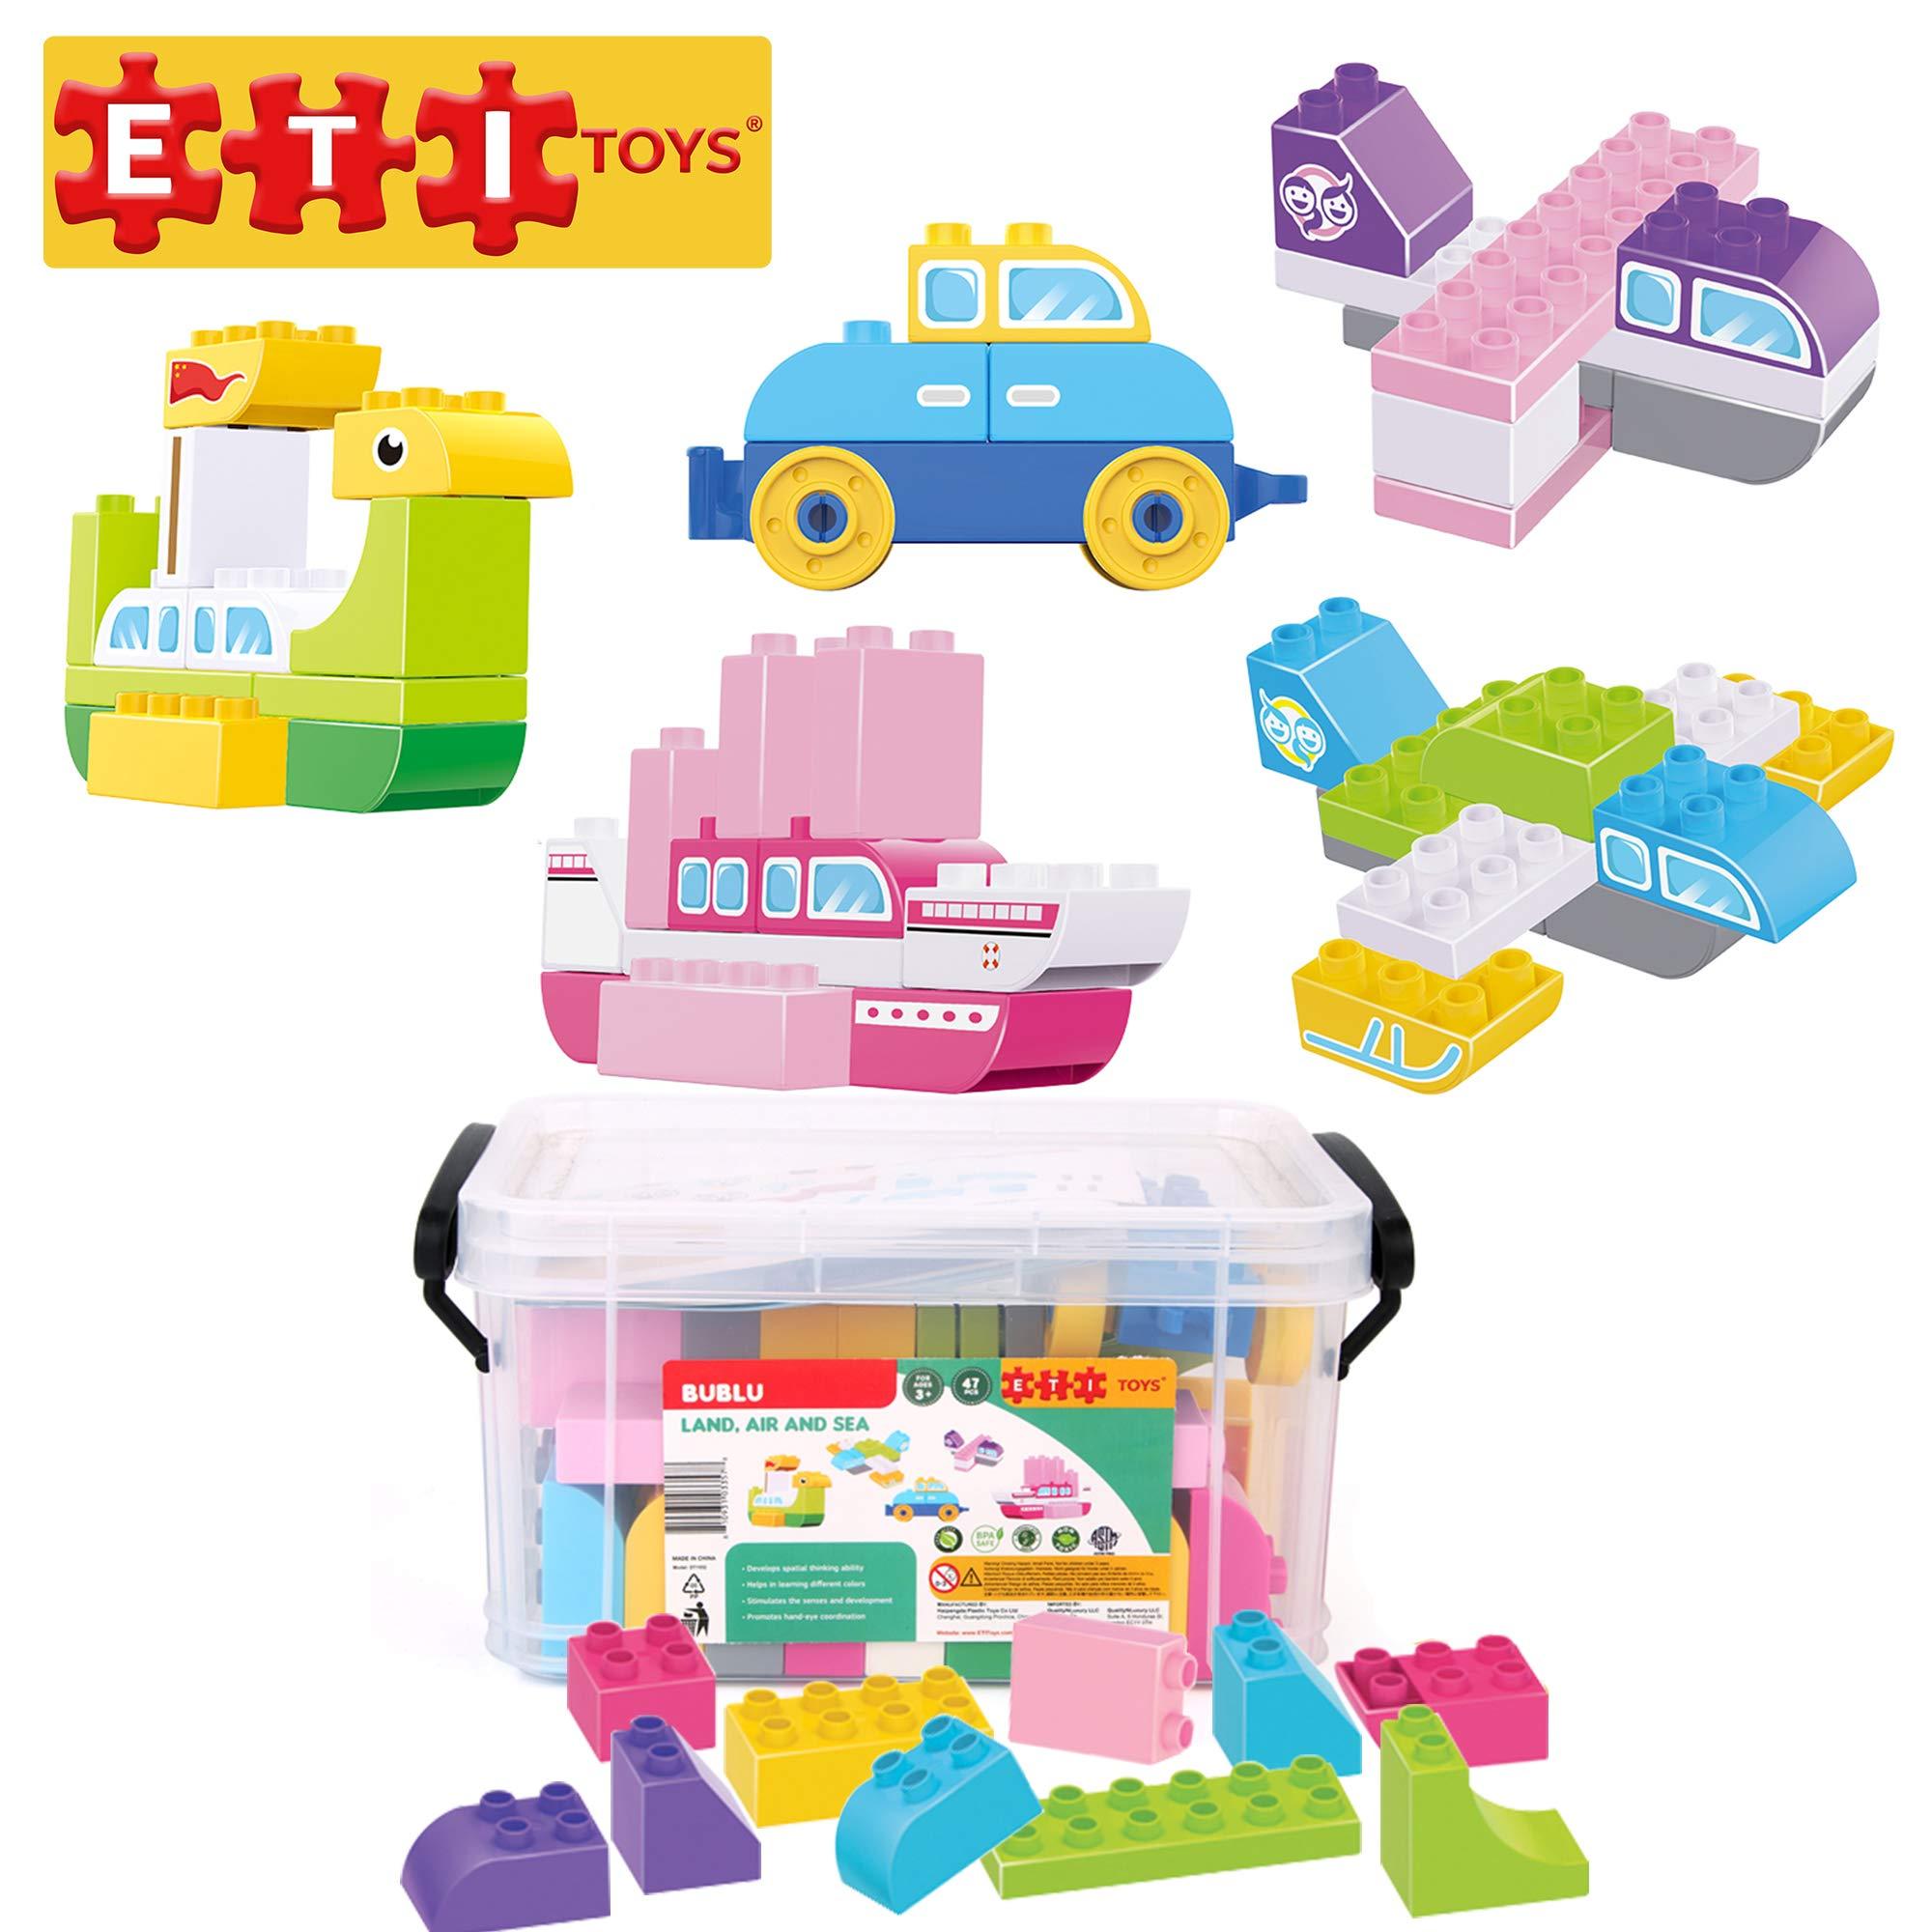 ETI Toys, 47 Piece Bublu Land, Air and Sea Building Blocks. Build Yacht, SUV, Seaplane, Sailplane. 100 Percent Safe, Fun, Creative Skills Development. Toy Gift for 3, 4, 5 Year Old Boys and Girls